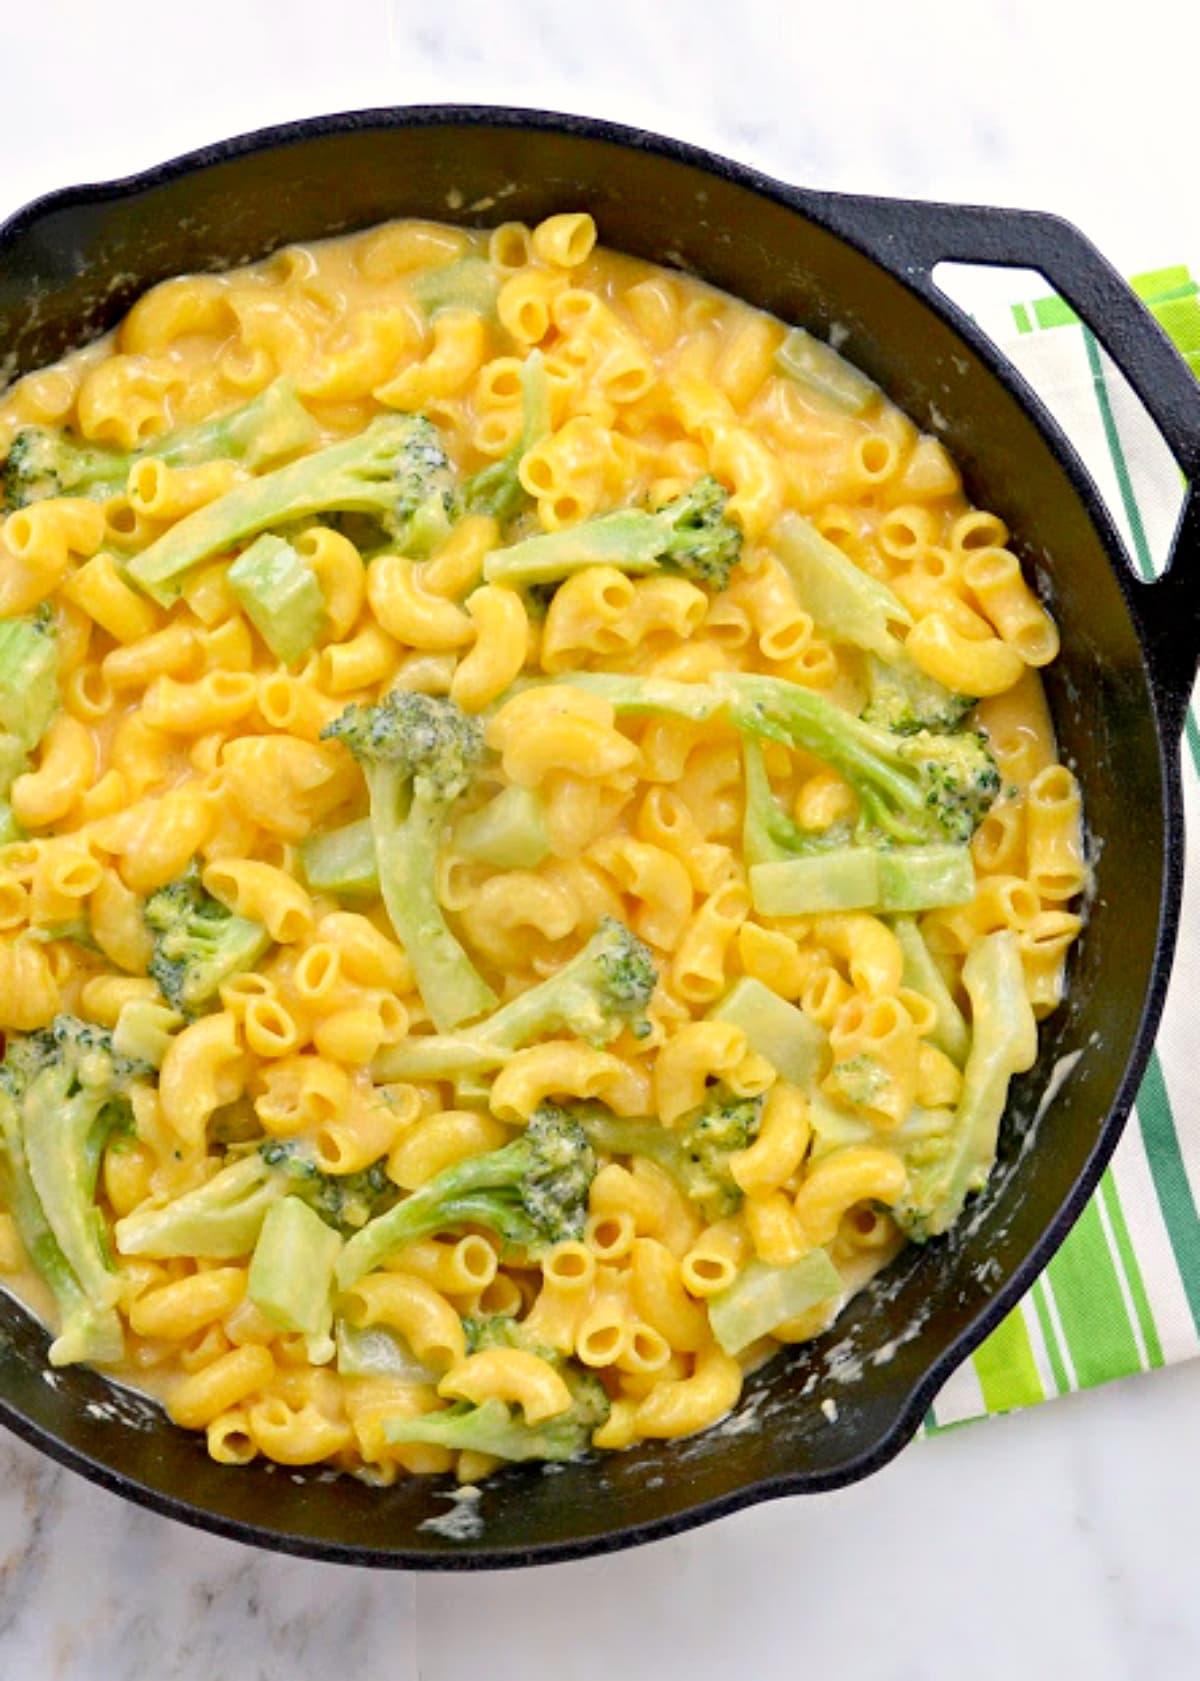 Macaroni and Cheese with Broccoli